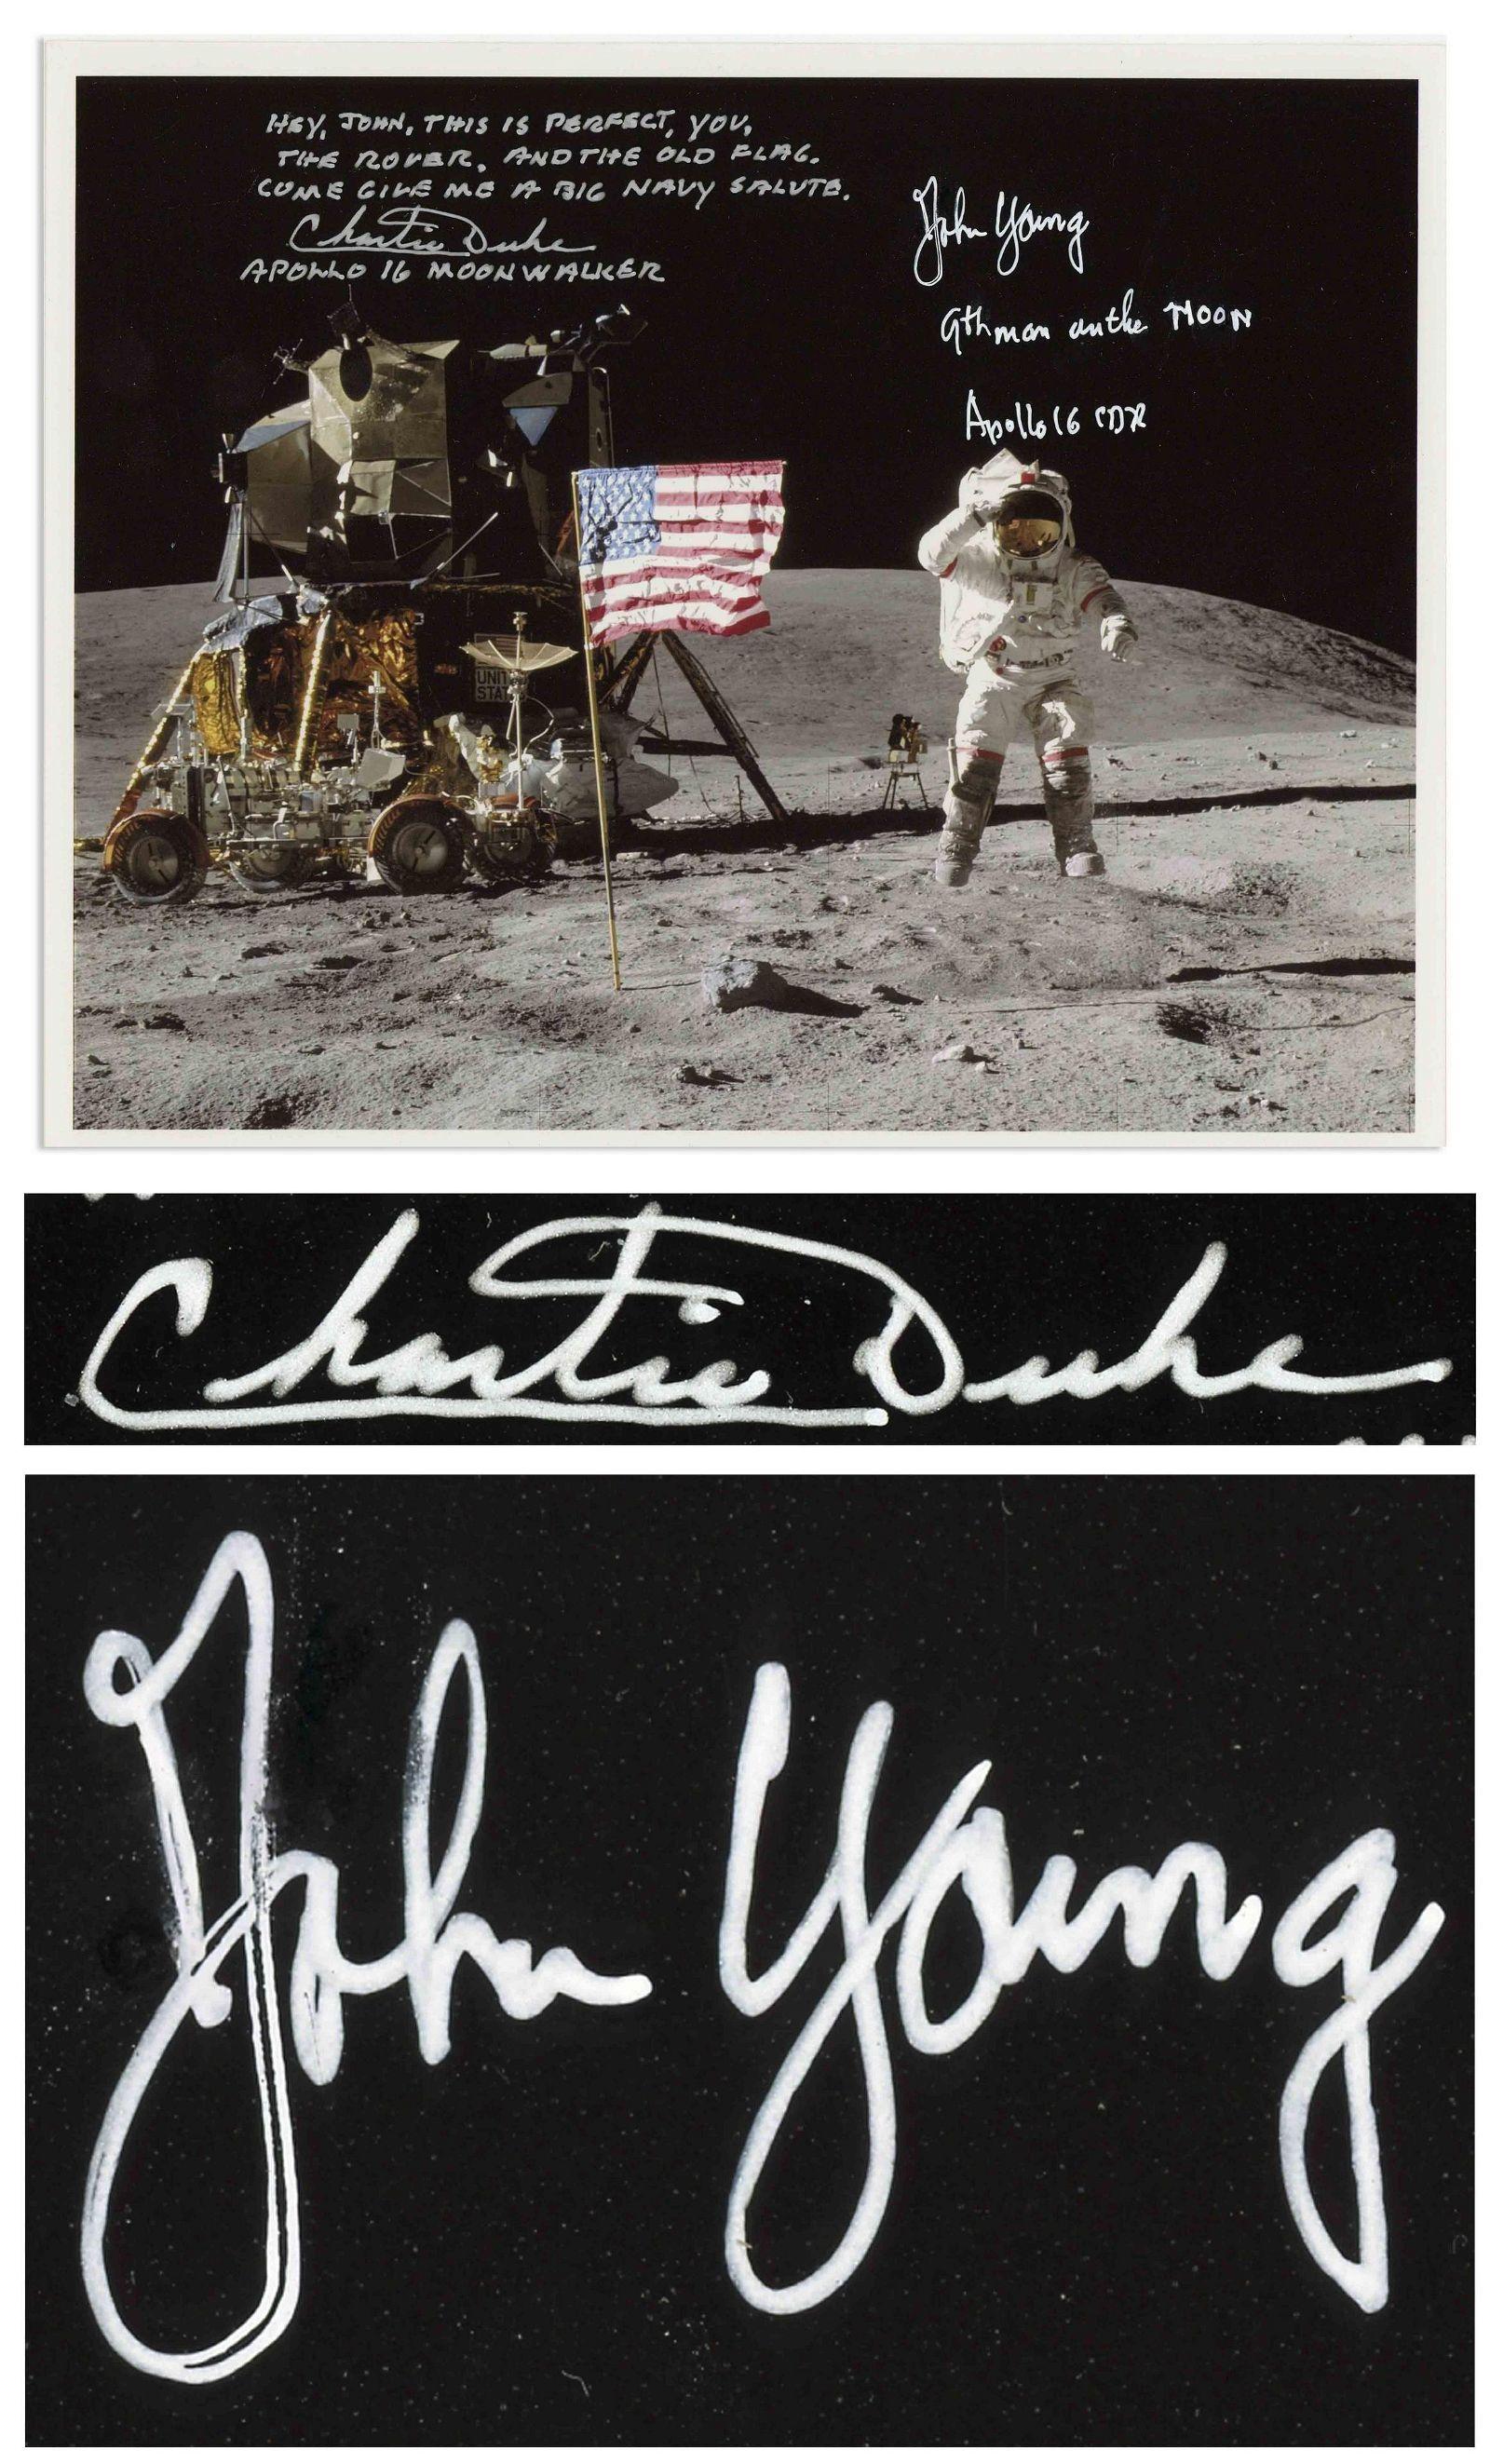 Apollo 16 Moonwalkers John Young and Charlie Duke